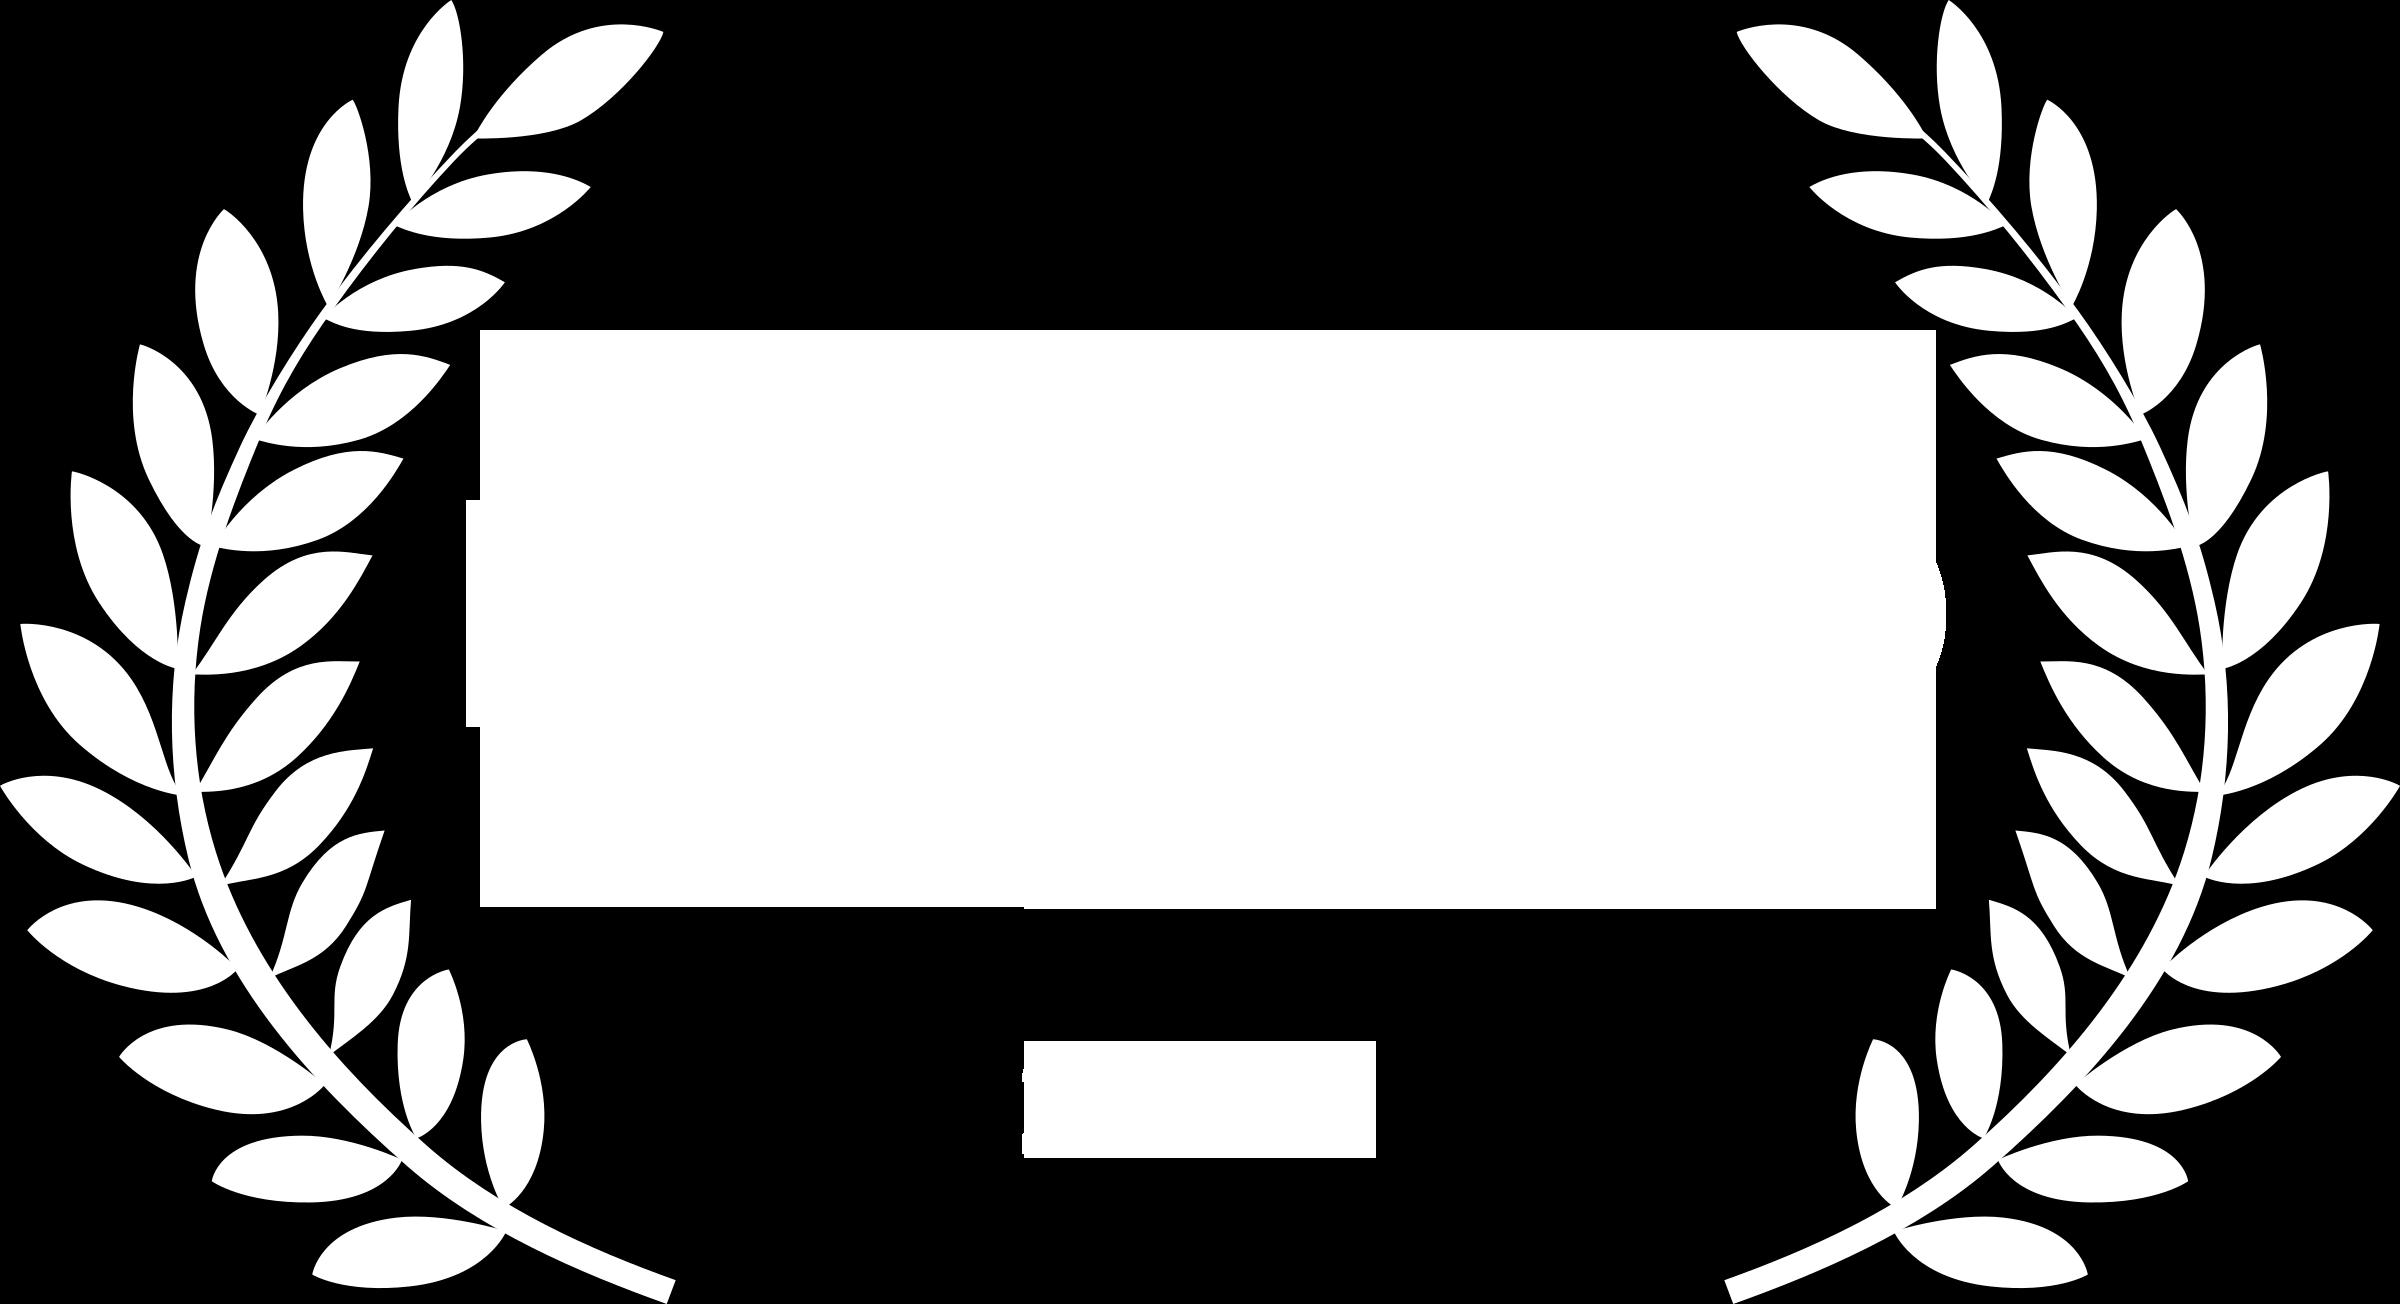 2018_FreelandLaurel_white.png